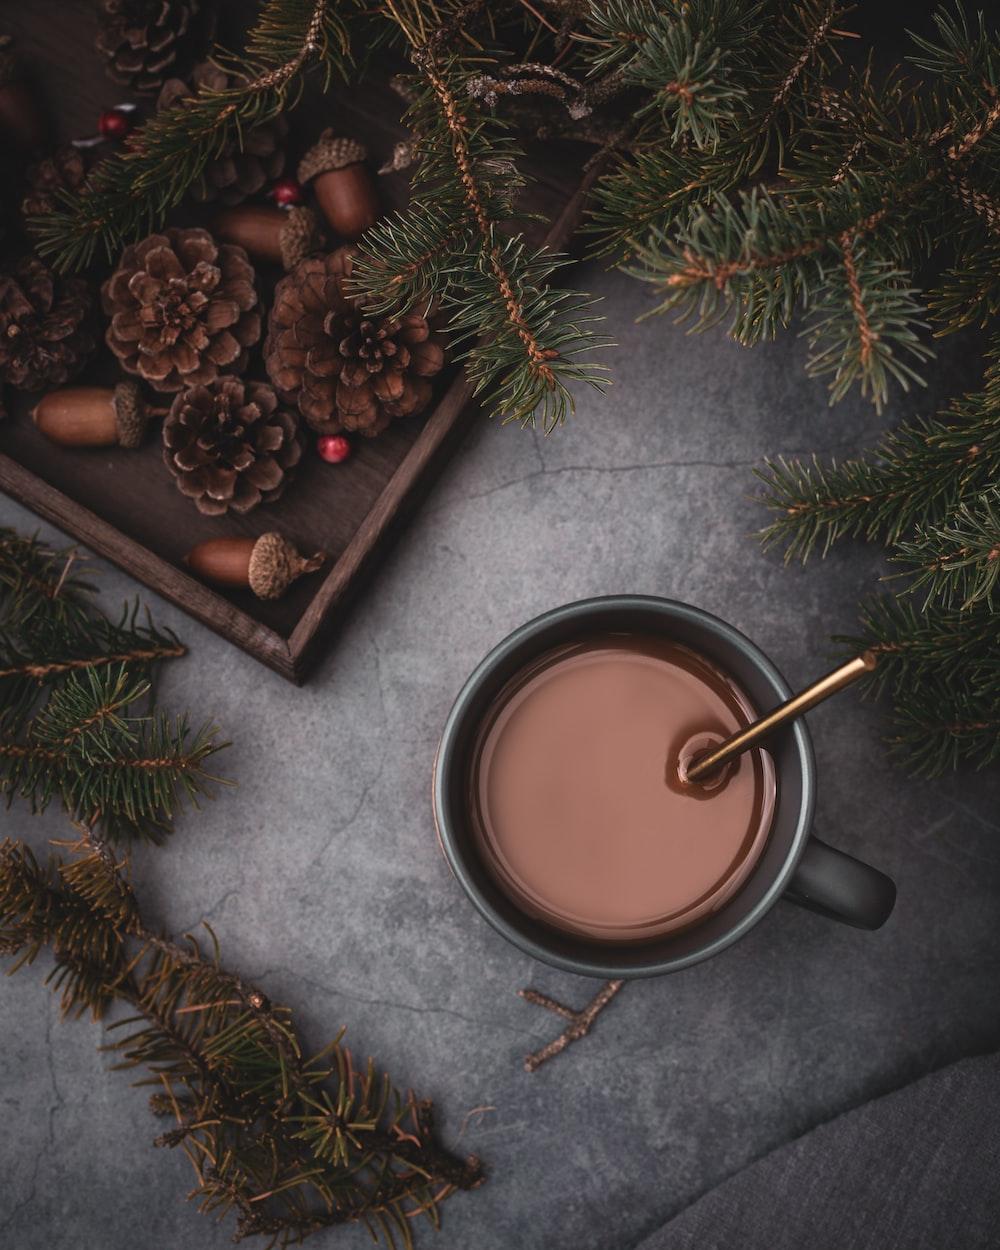 full mug beside pinecones